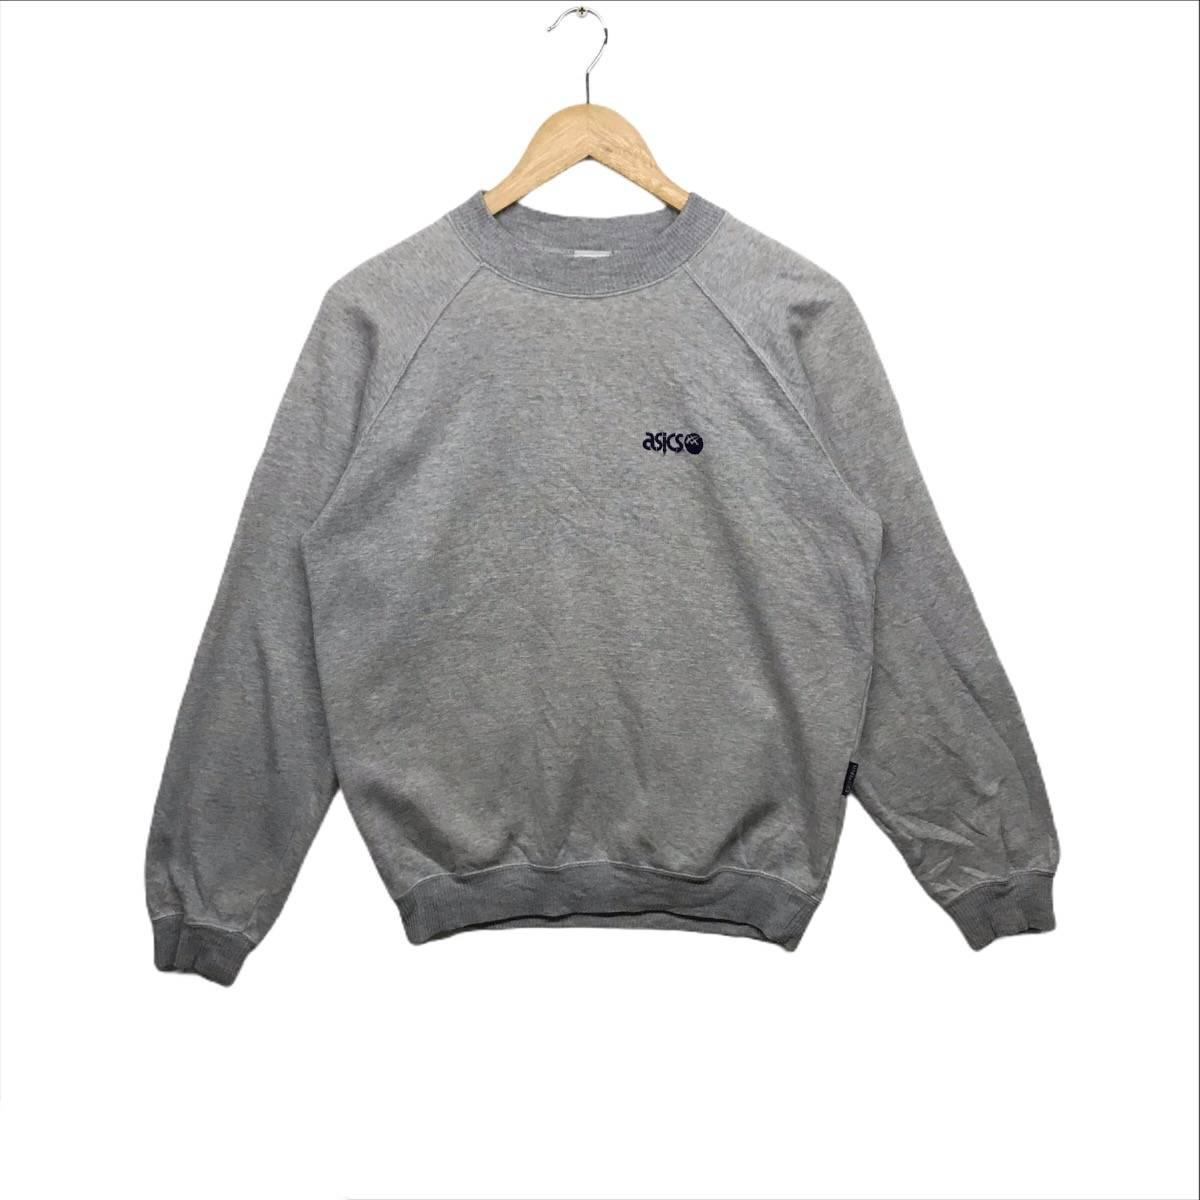 Asics Asics Sweatshirt